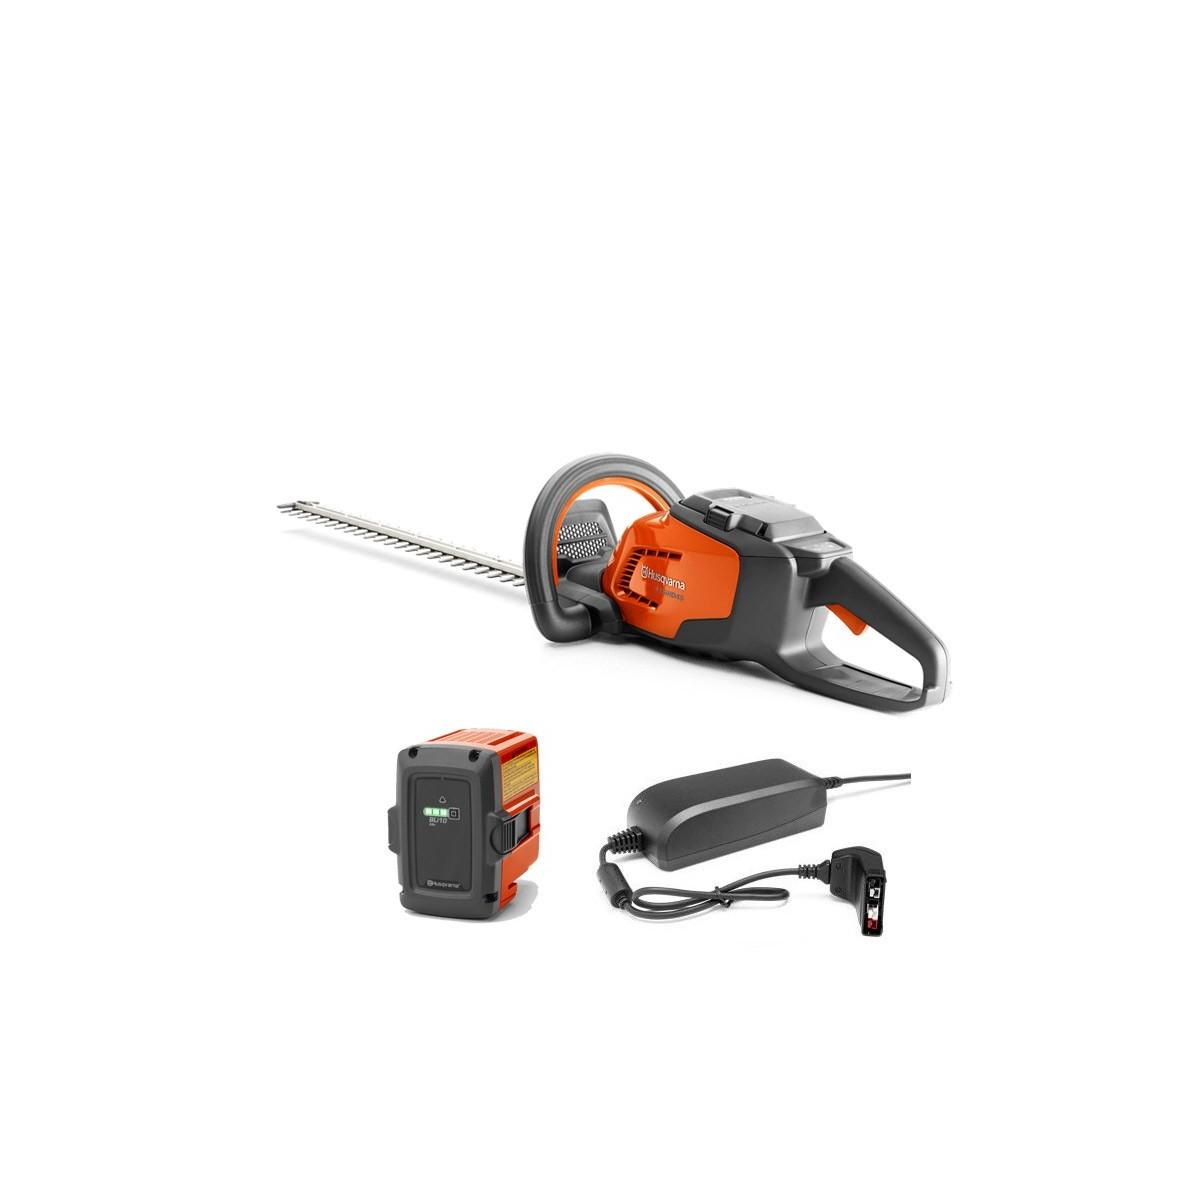 Husqvarna cortasetos bateria-36v  kit 115ihd45 45cm 25mm (bli10 + qc80)